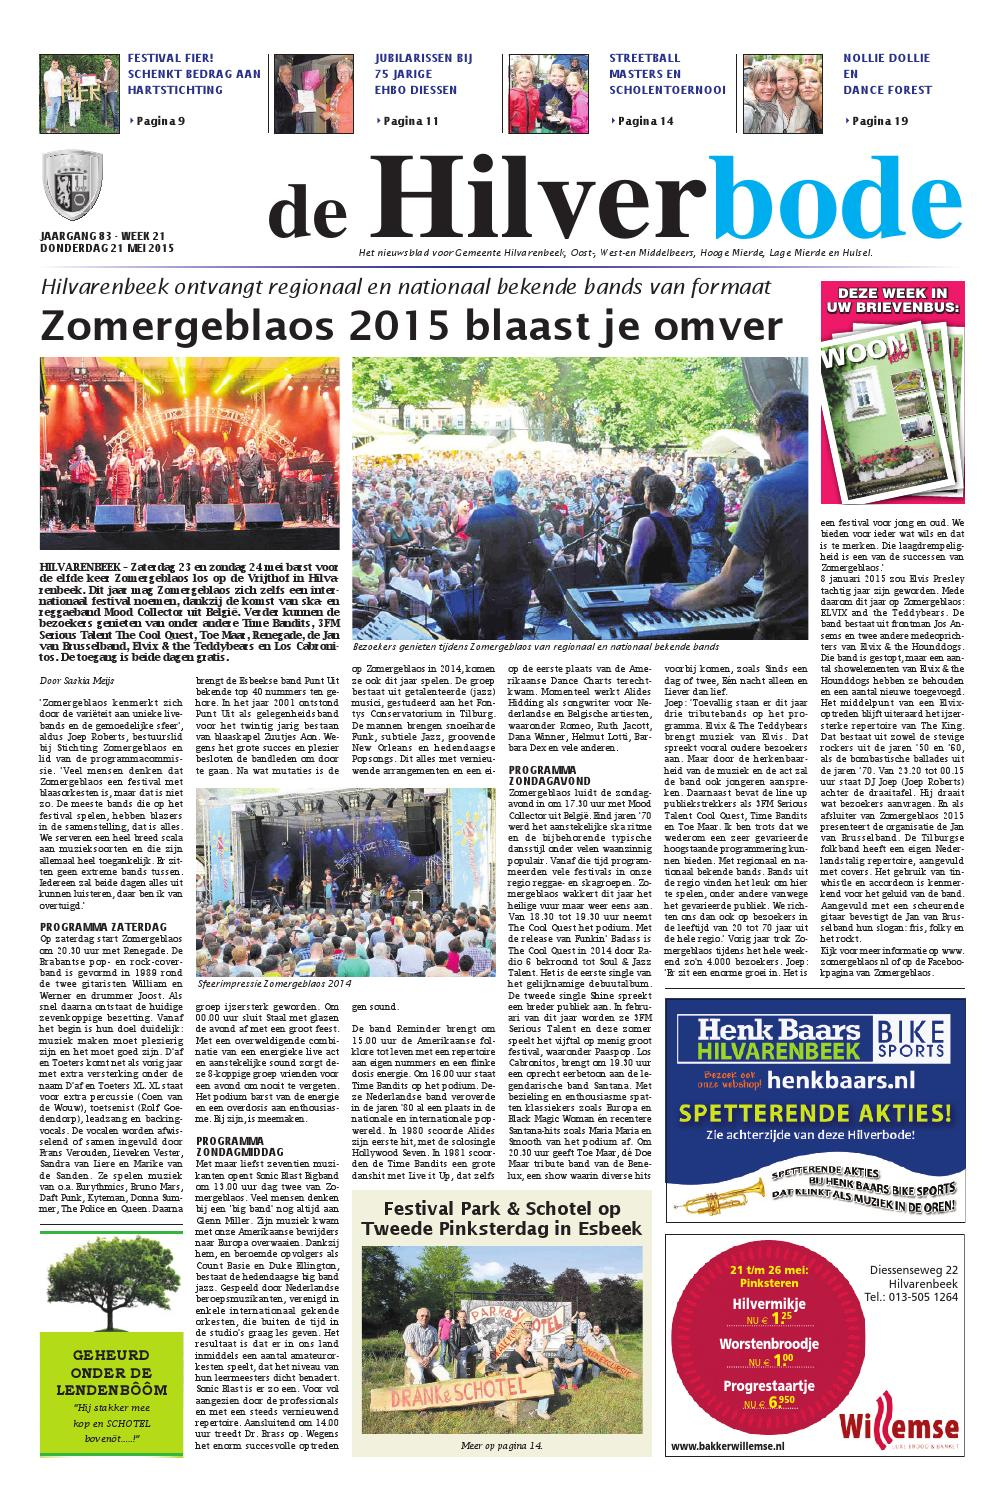 De Hilverbode 21-05-2015 by Uitgeverij Em de Jong - issuu: issuu.com/uitgeverij/docs/hv_20150521